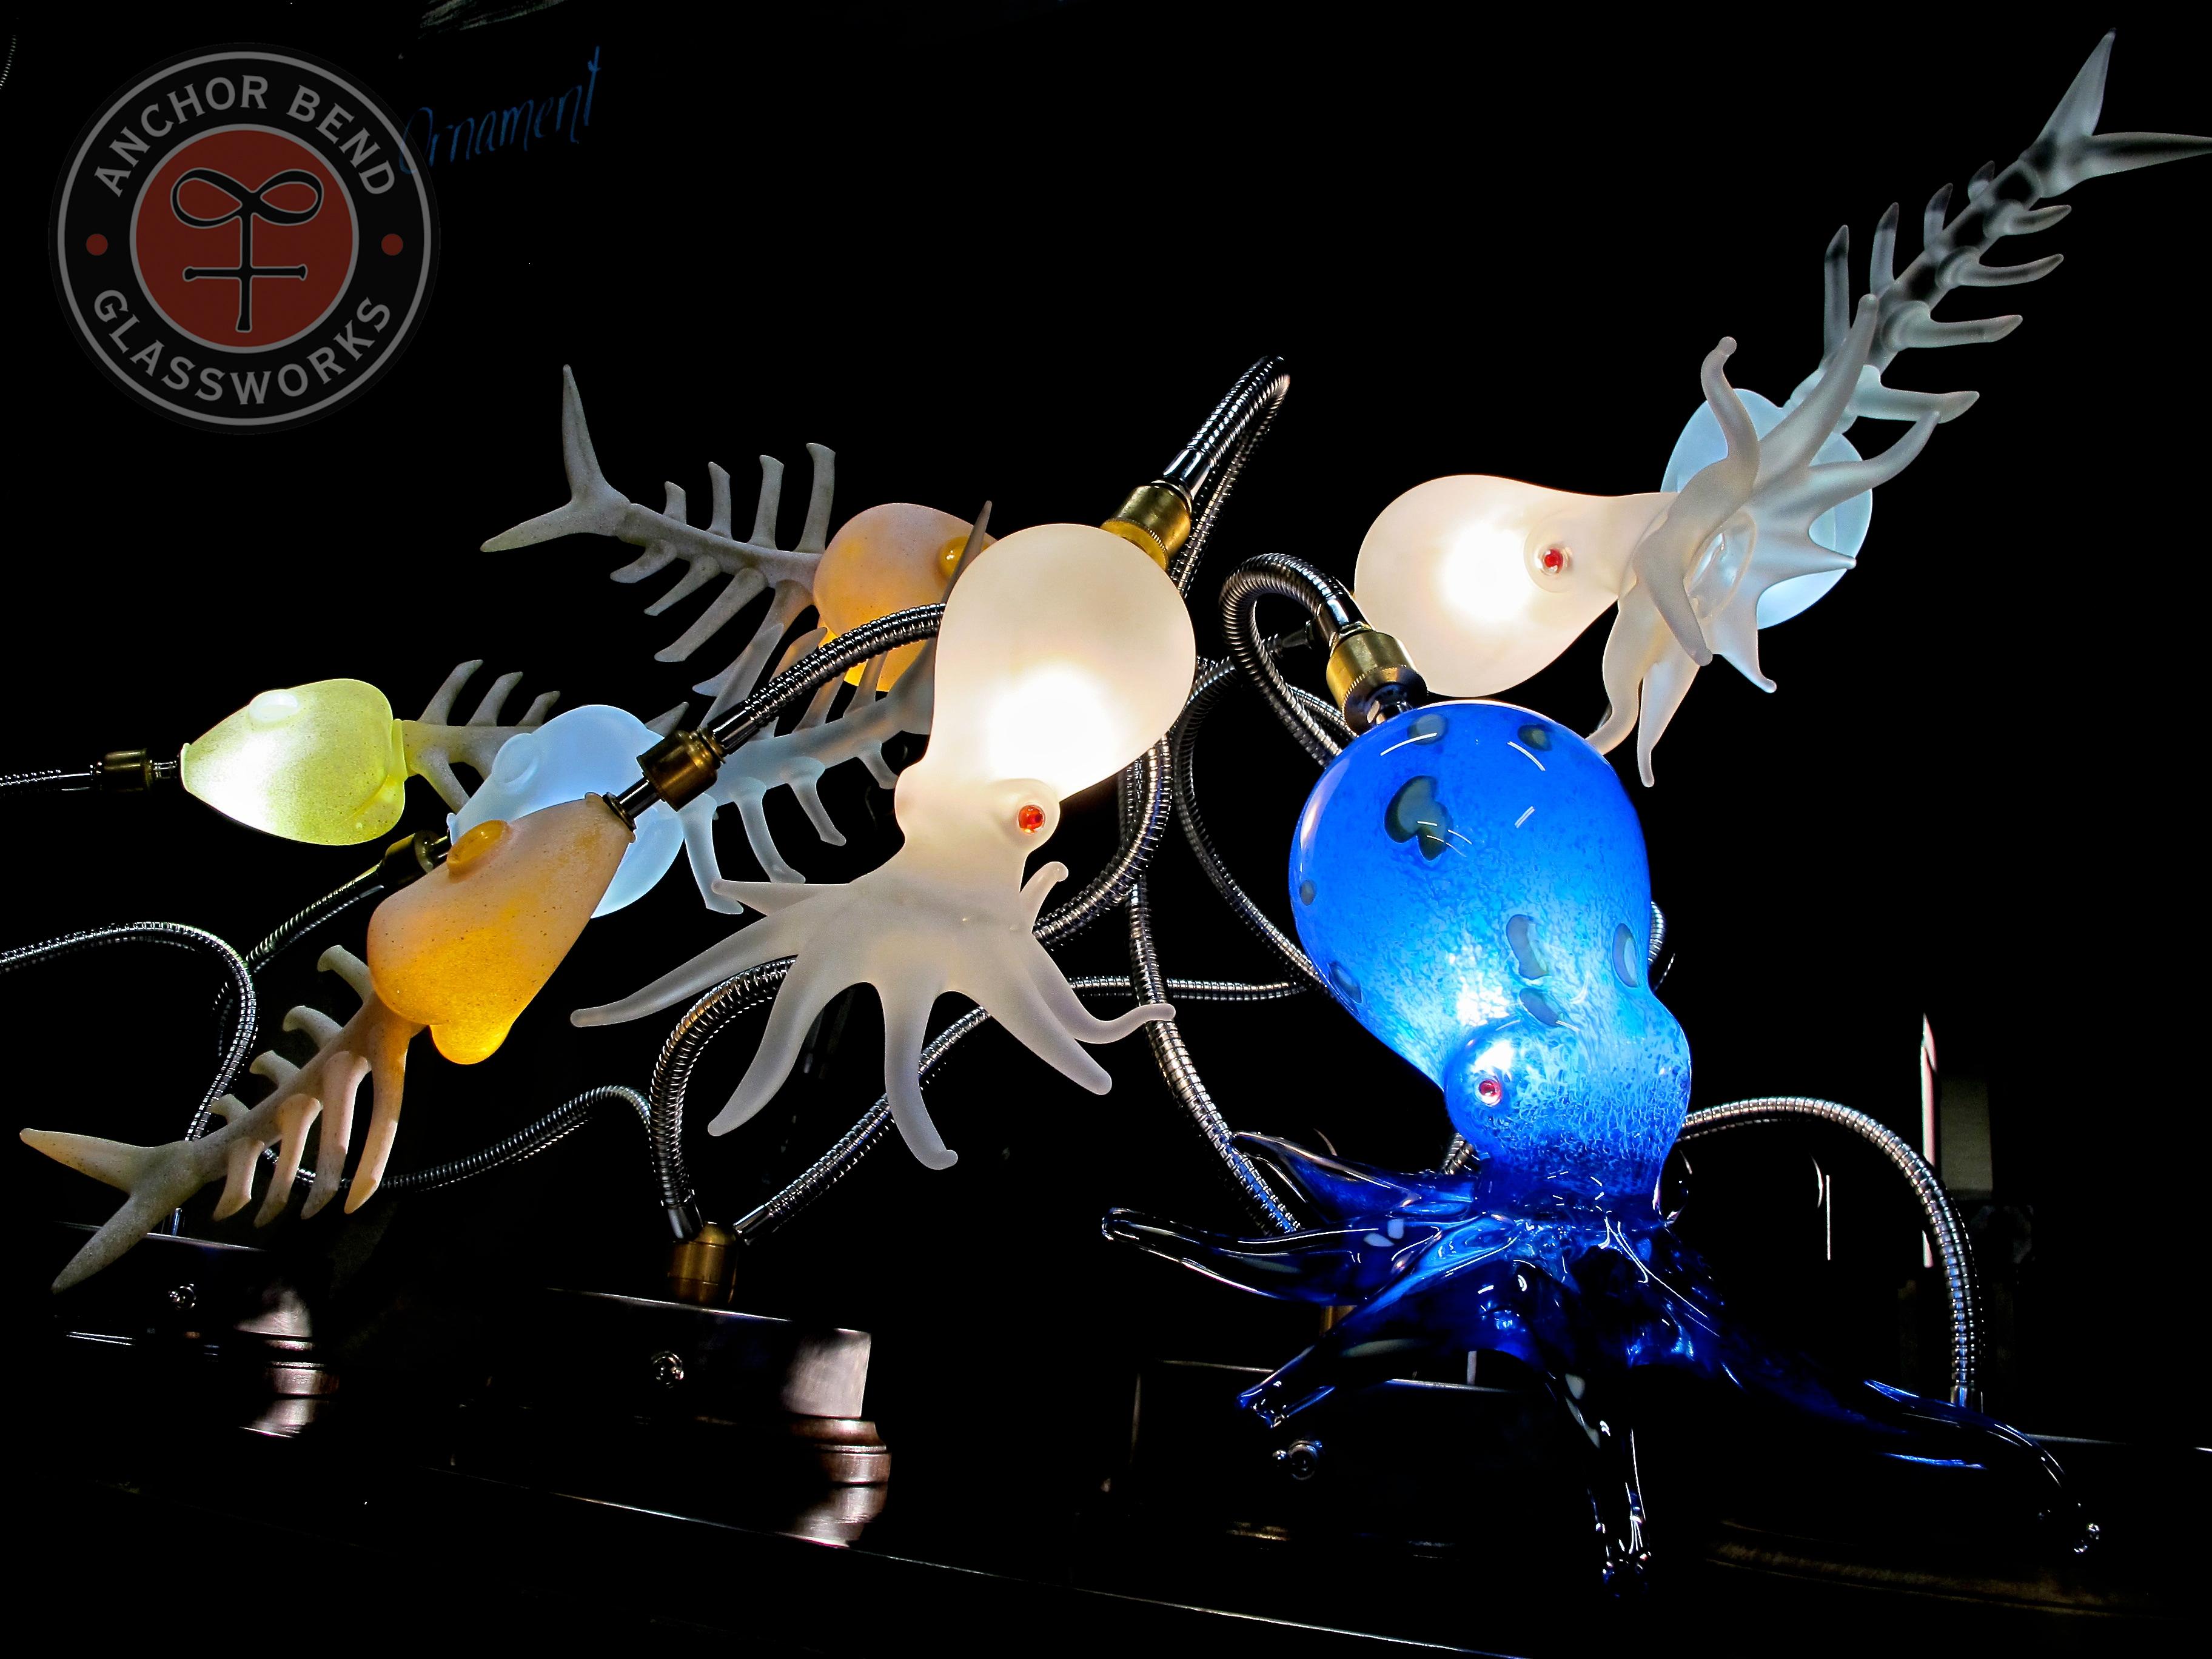 Octopus & Fishbone Lamps